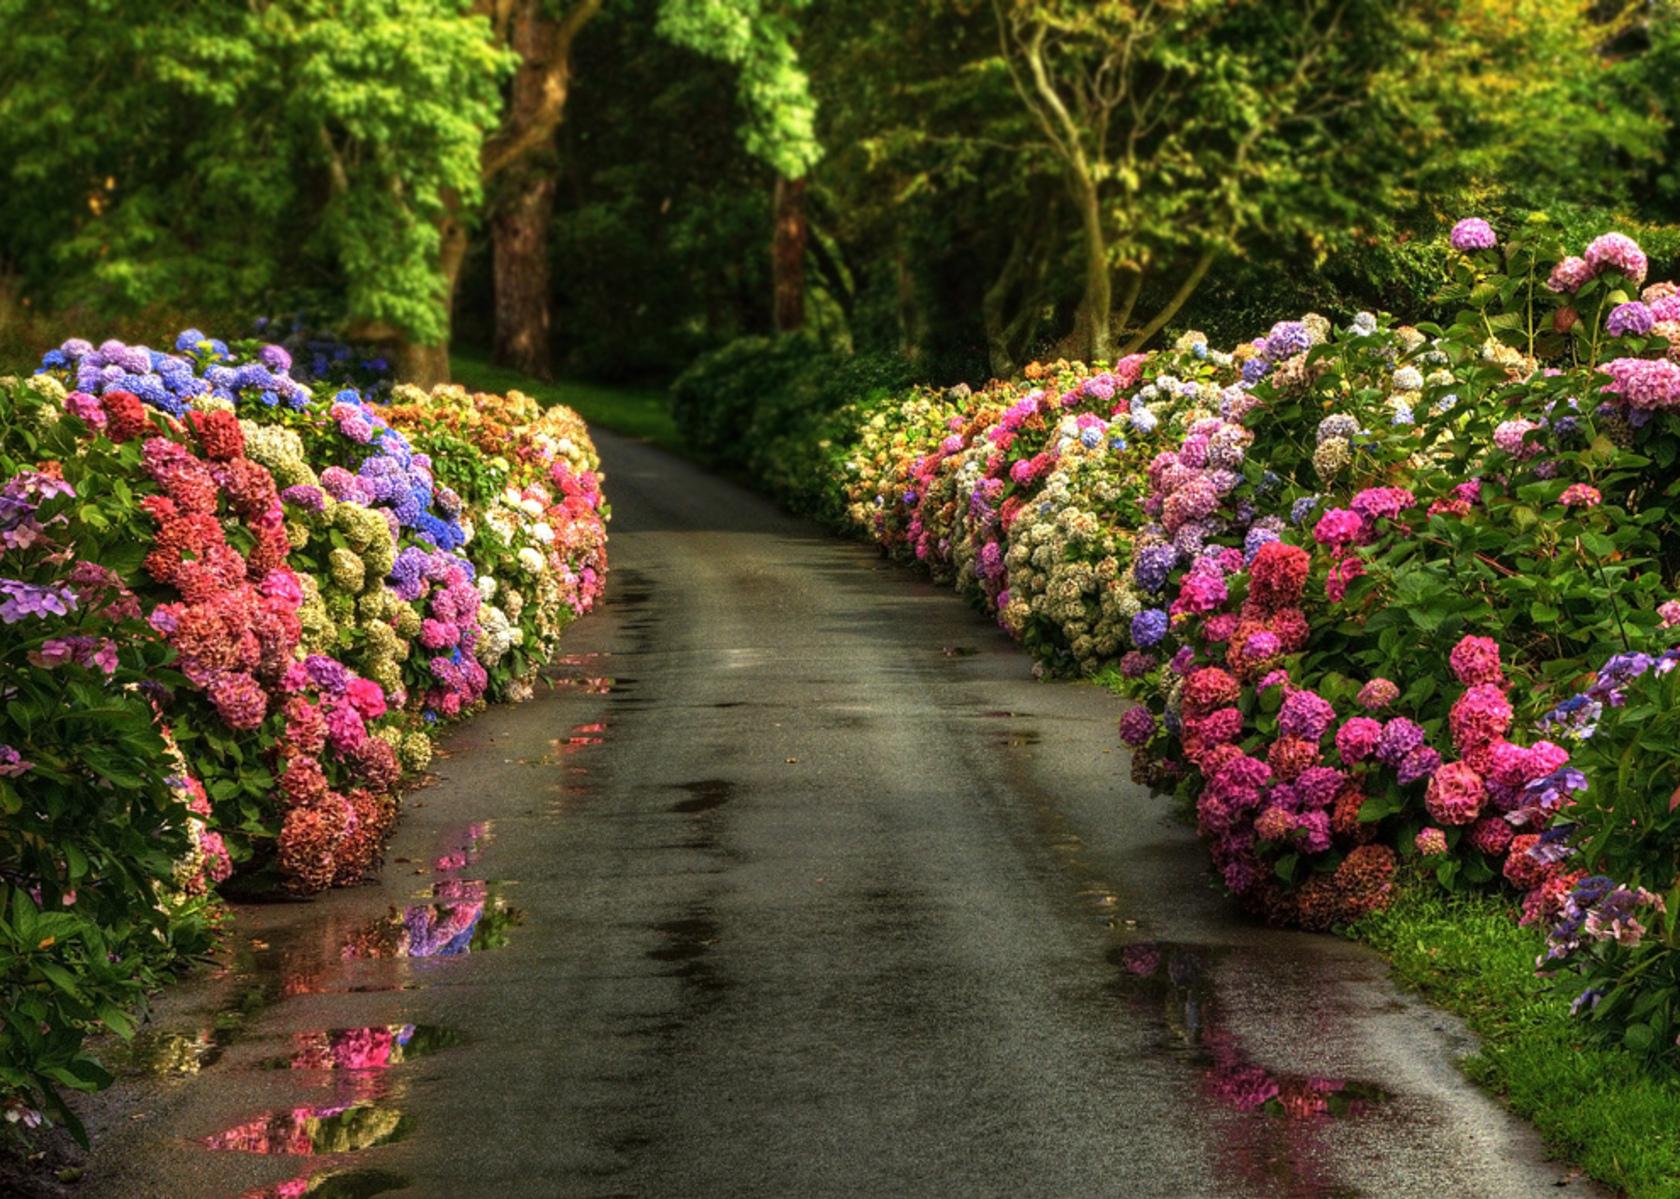 Flowers Wallpapers For Desktop Full Size Hd Fondos De Pantalla De Primavera Wallpapers Hd